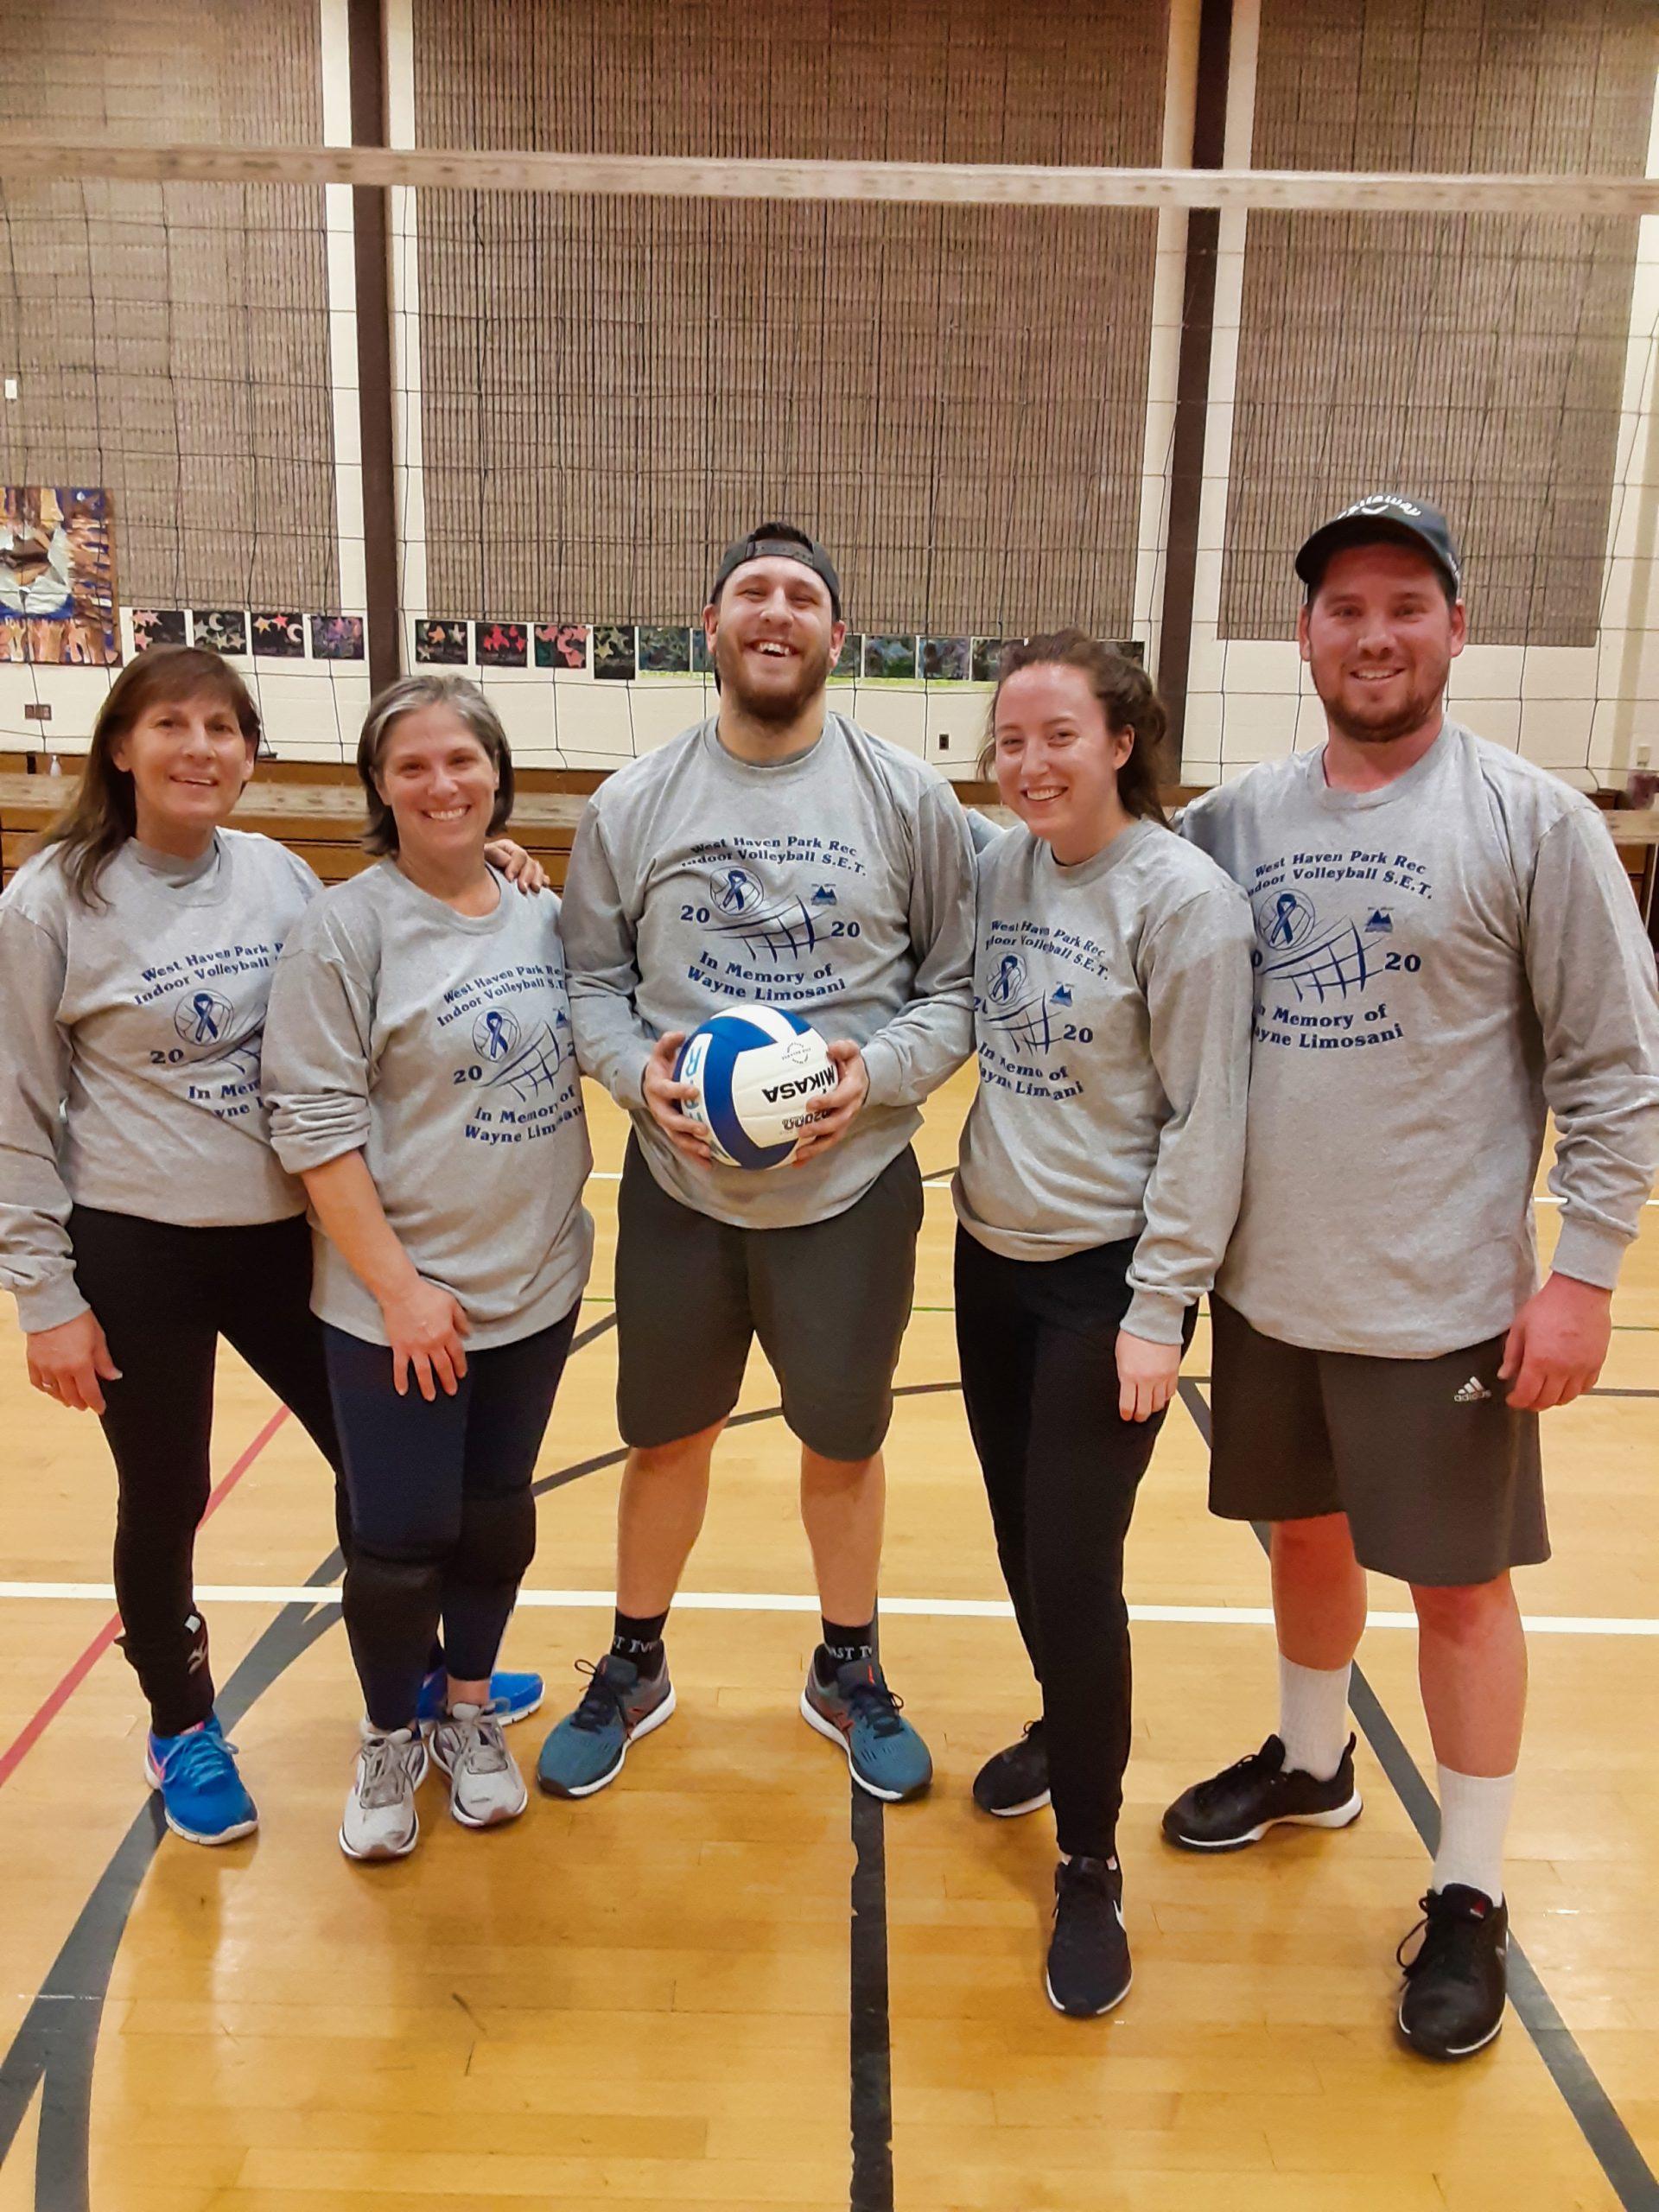 Volleyball tourney raises $975